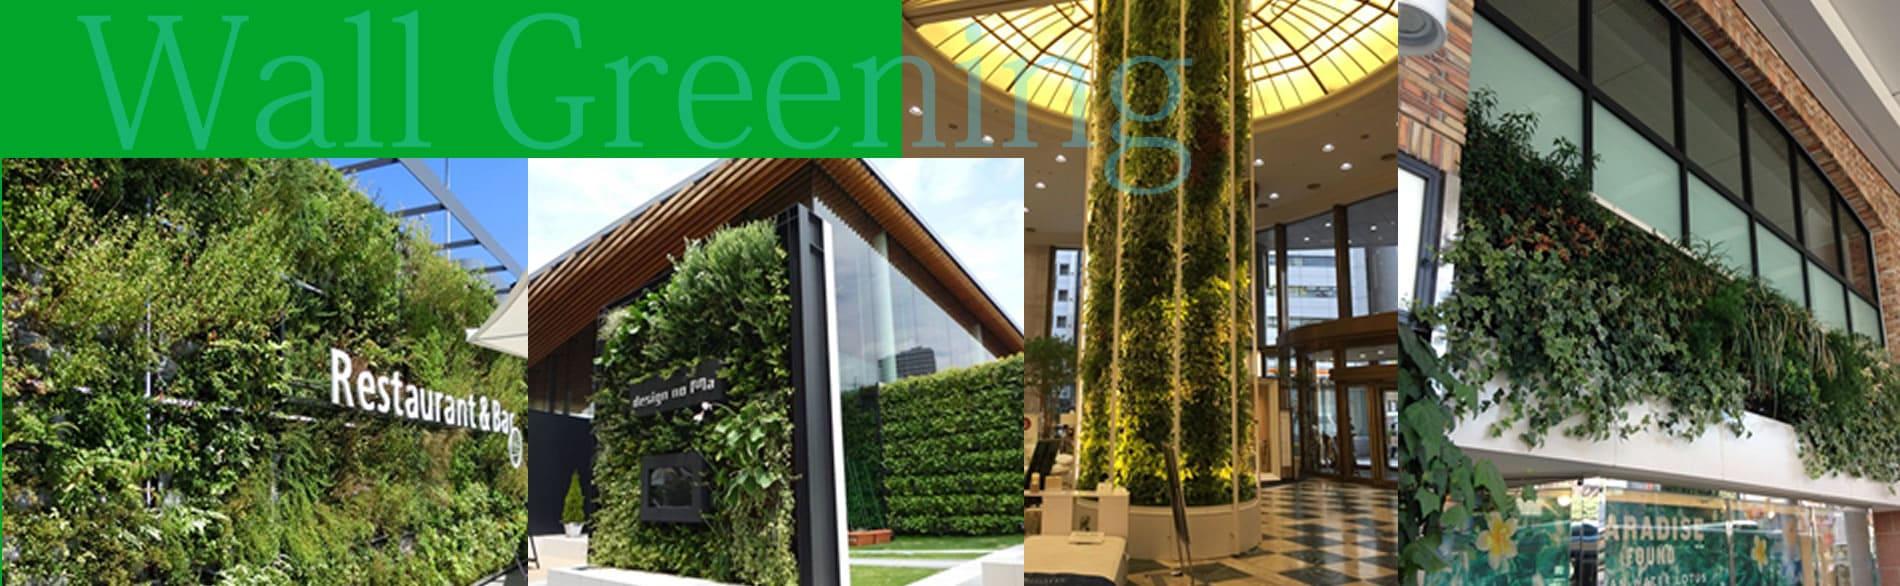 Wall Greening